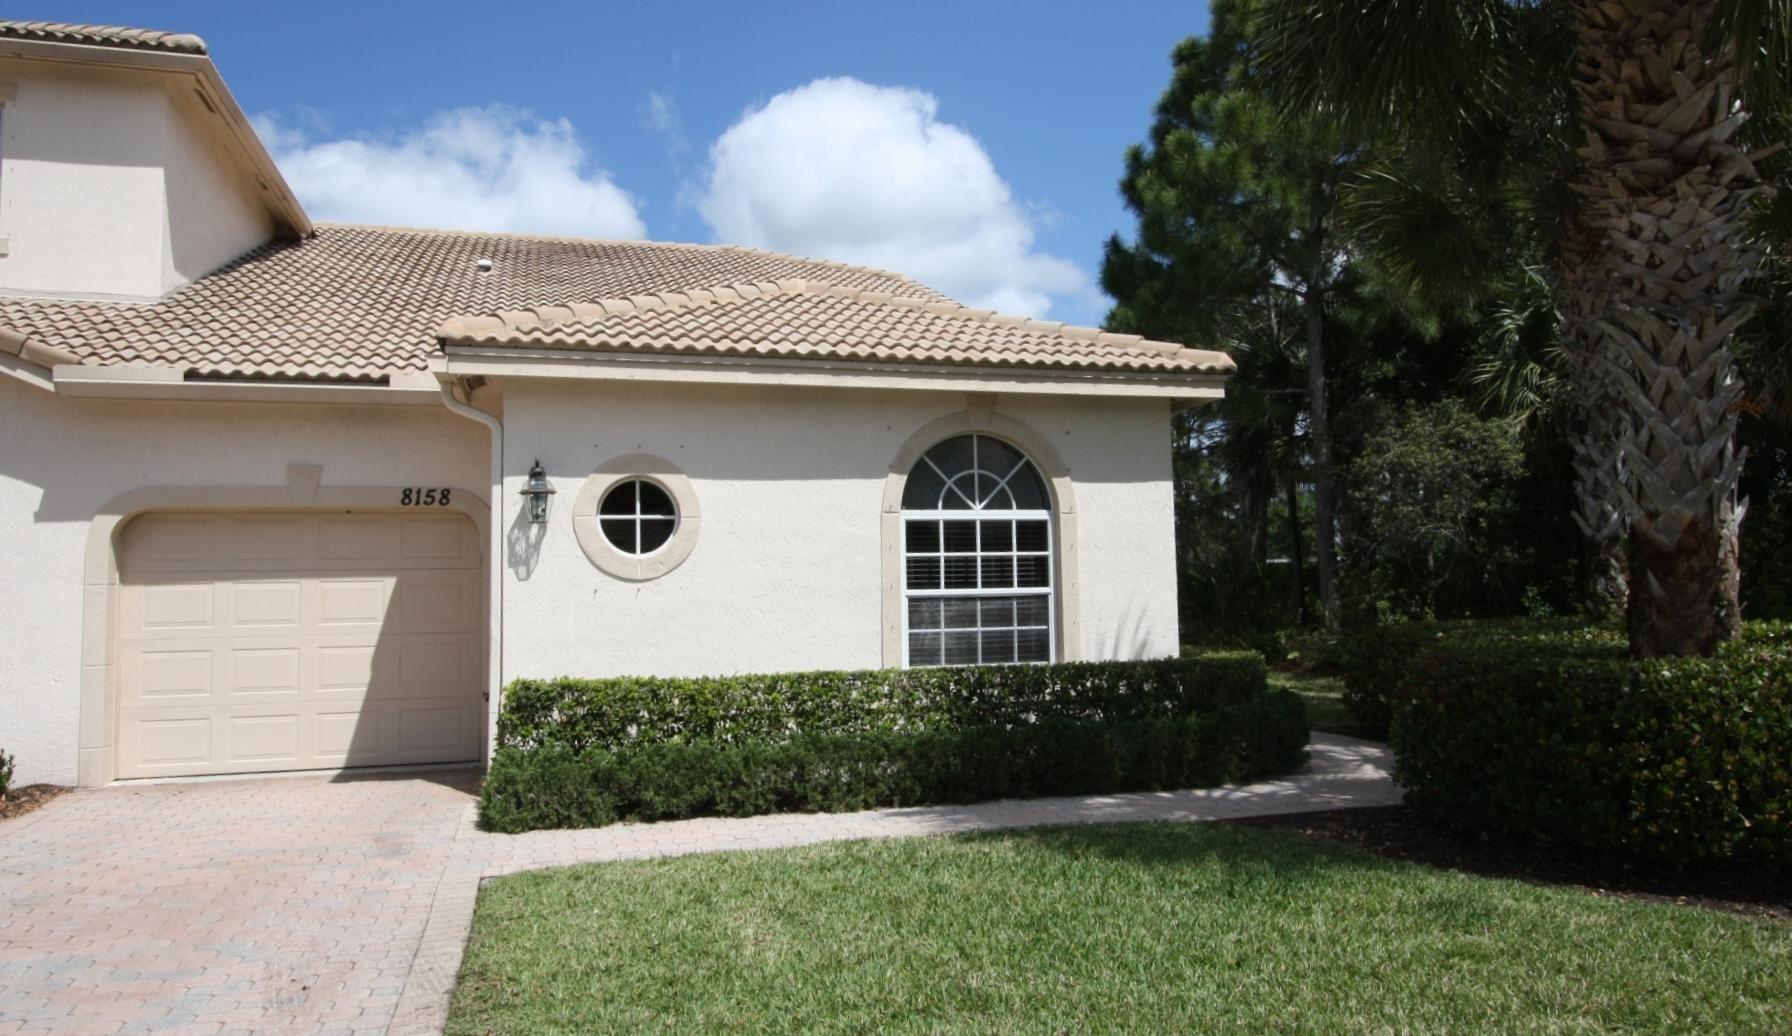 8158 Mulligan Circle, Port Saint Lucie, FL 34986 - #: RX-10610641